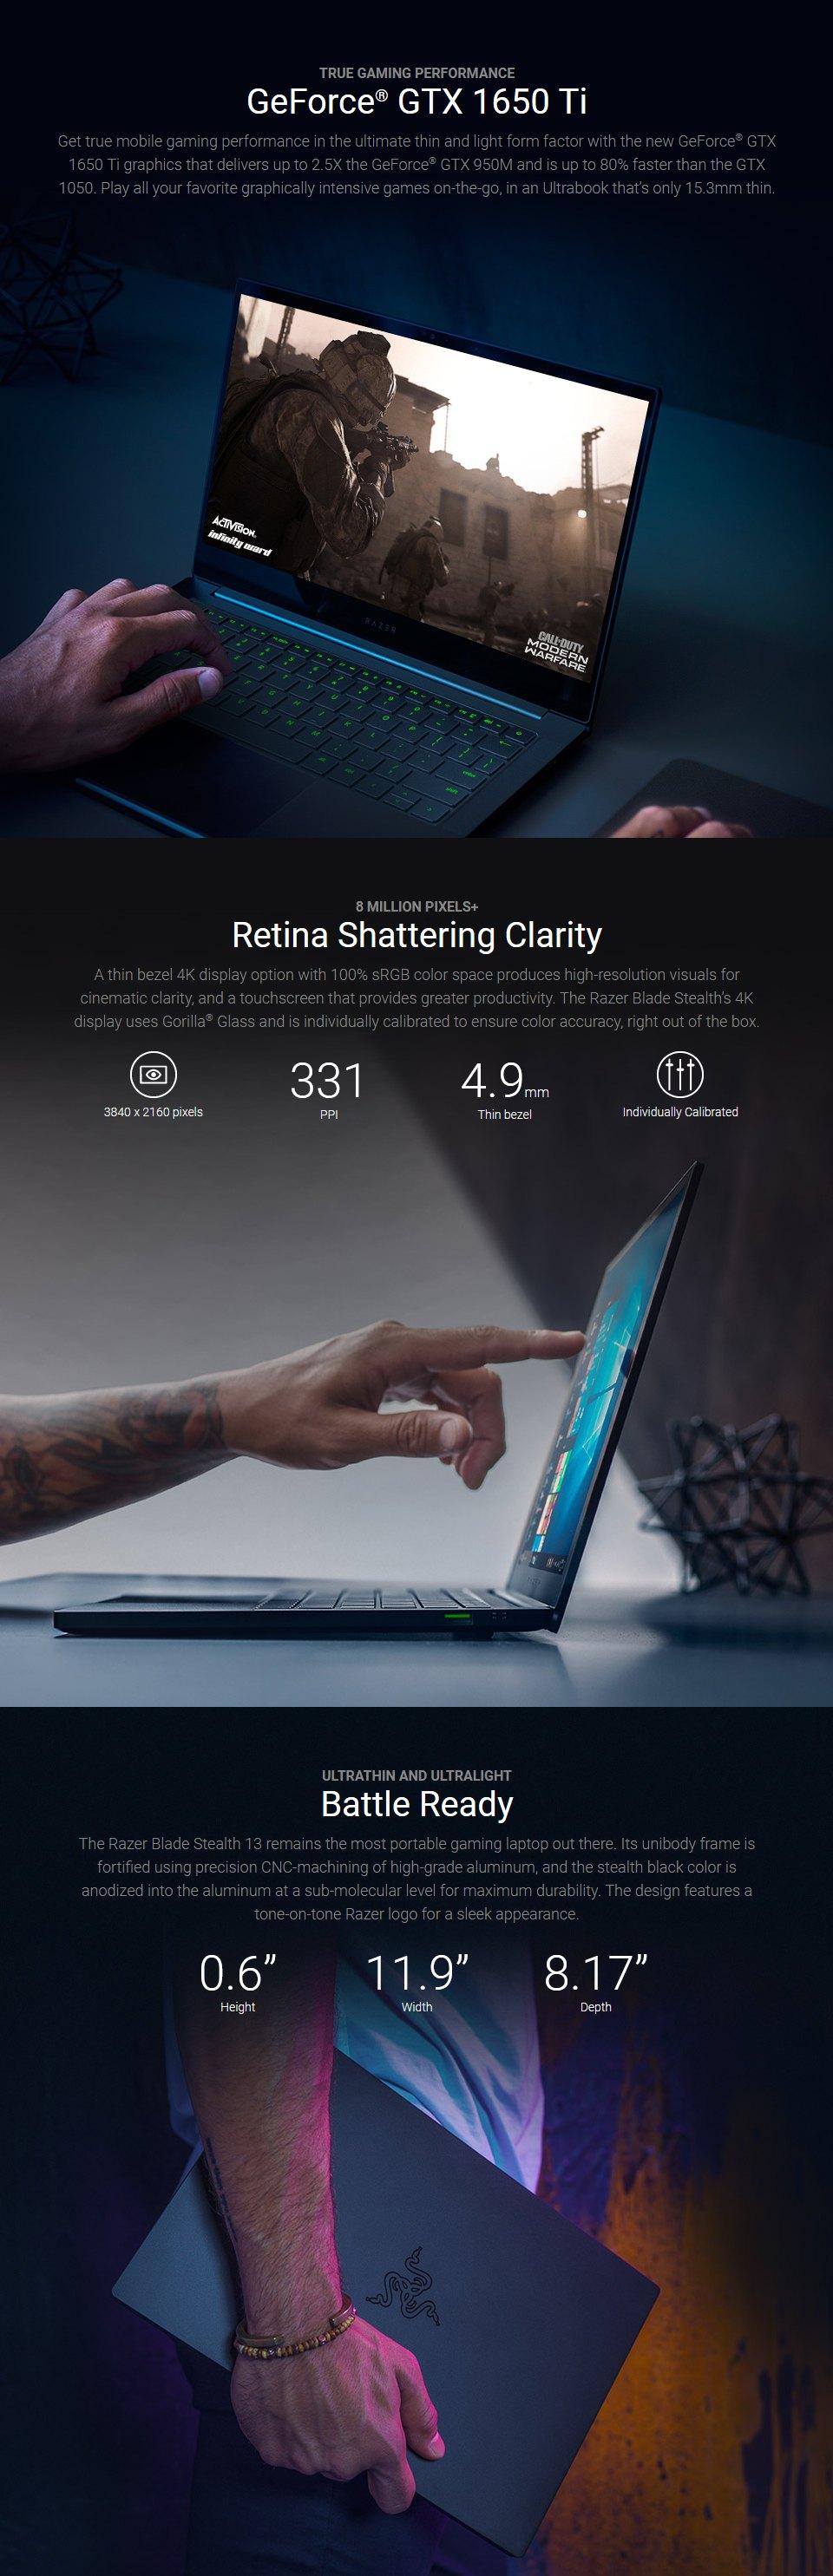 Razer Blade Stealth 13.3in Core i7 GTX 1650 Ti Ultrabook features 2